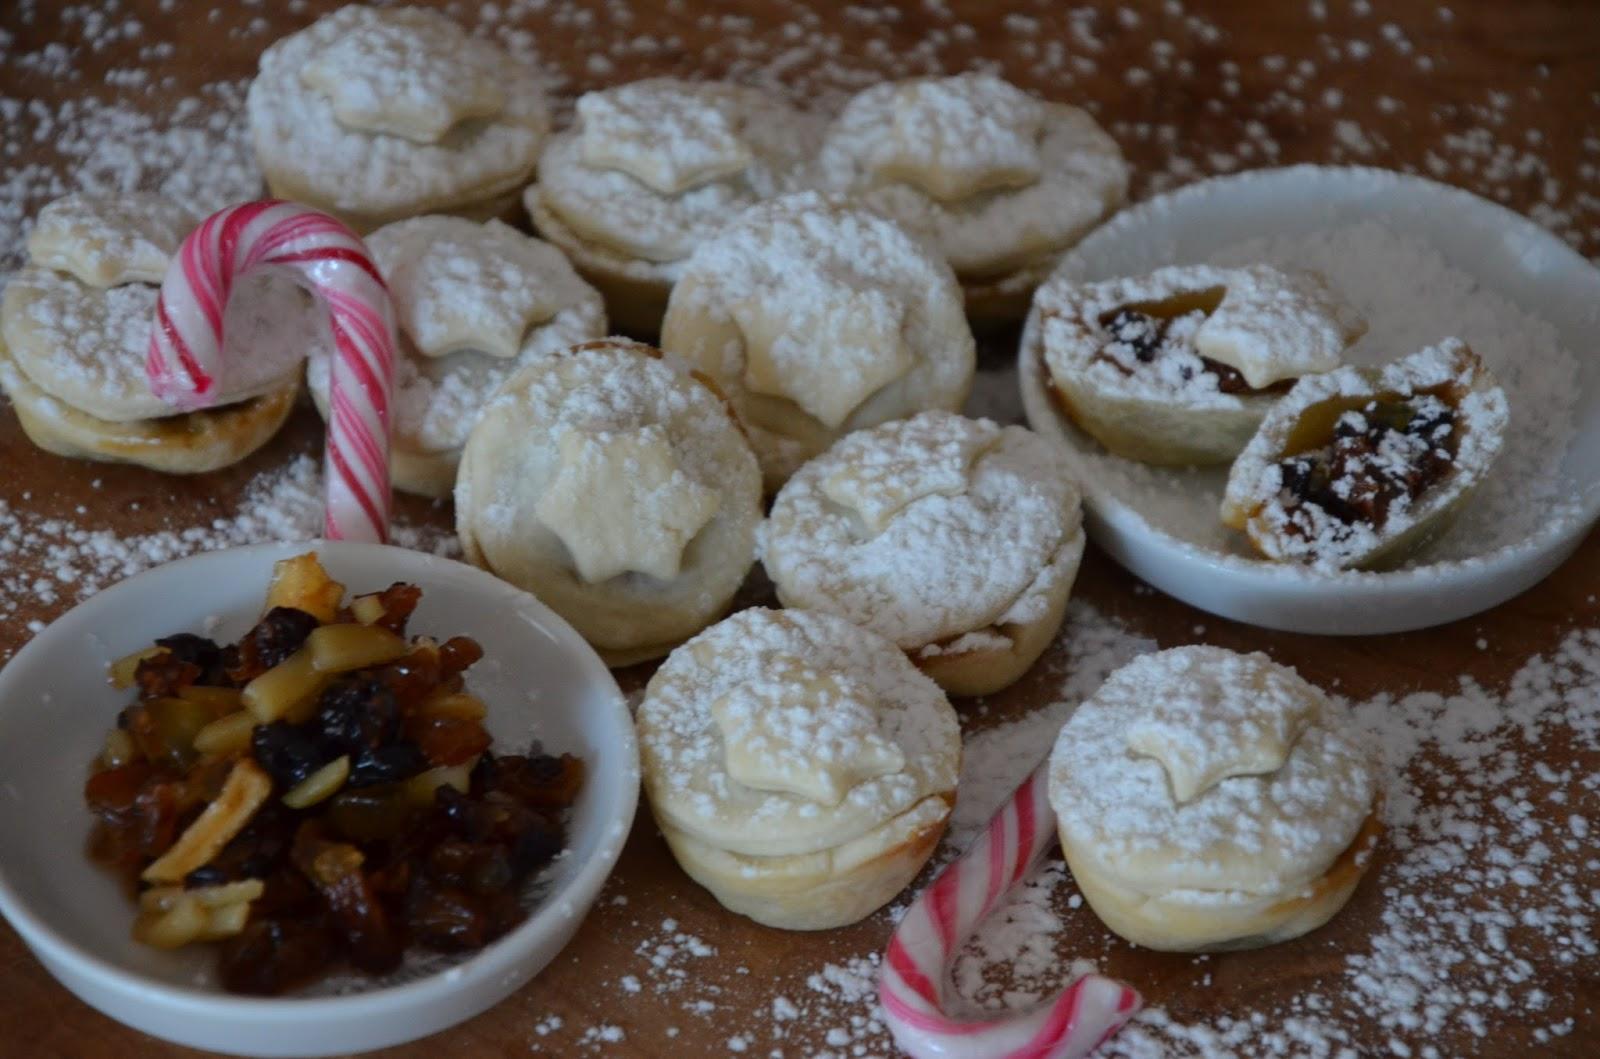 Traditionelles Weihnachtsgebäck.Mince Pies Ein Traditionelles Englisches Weihnachtsgebäck